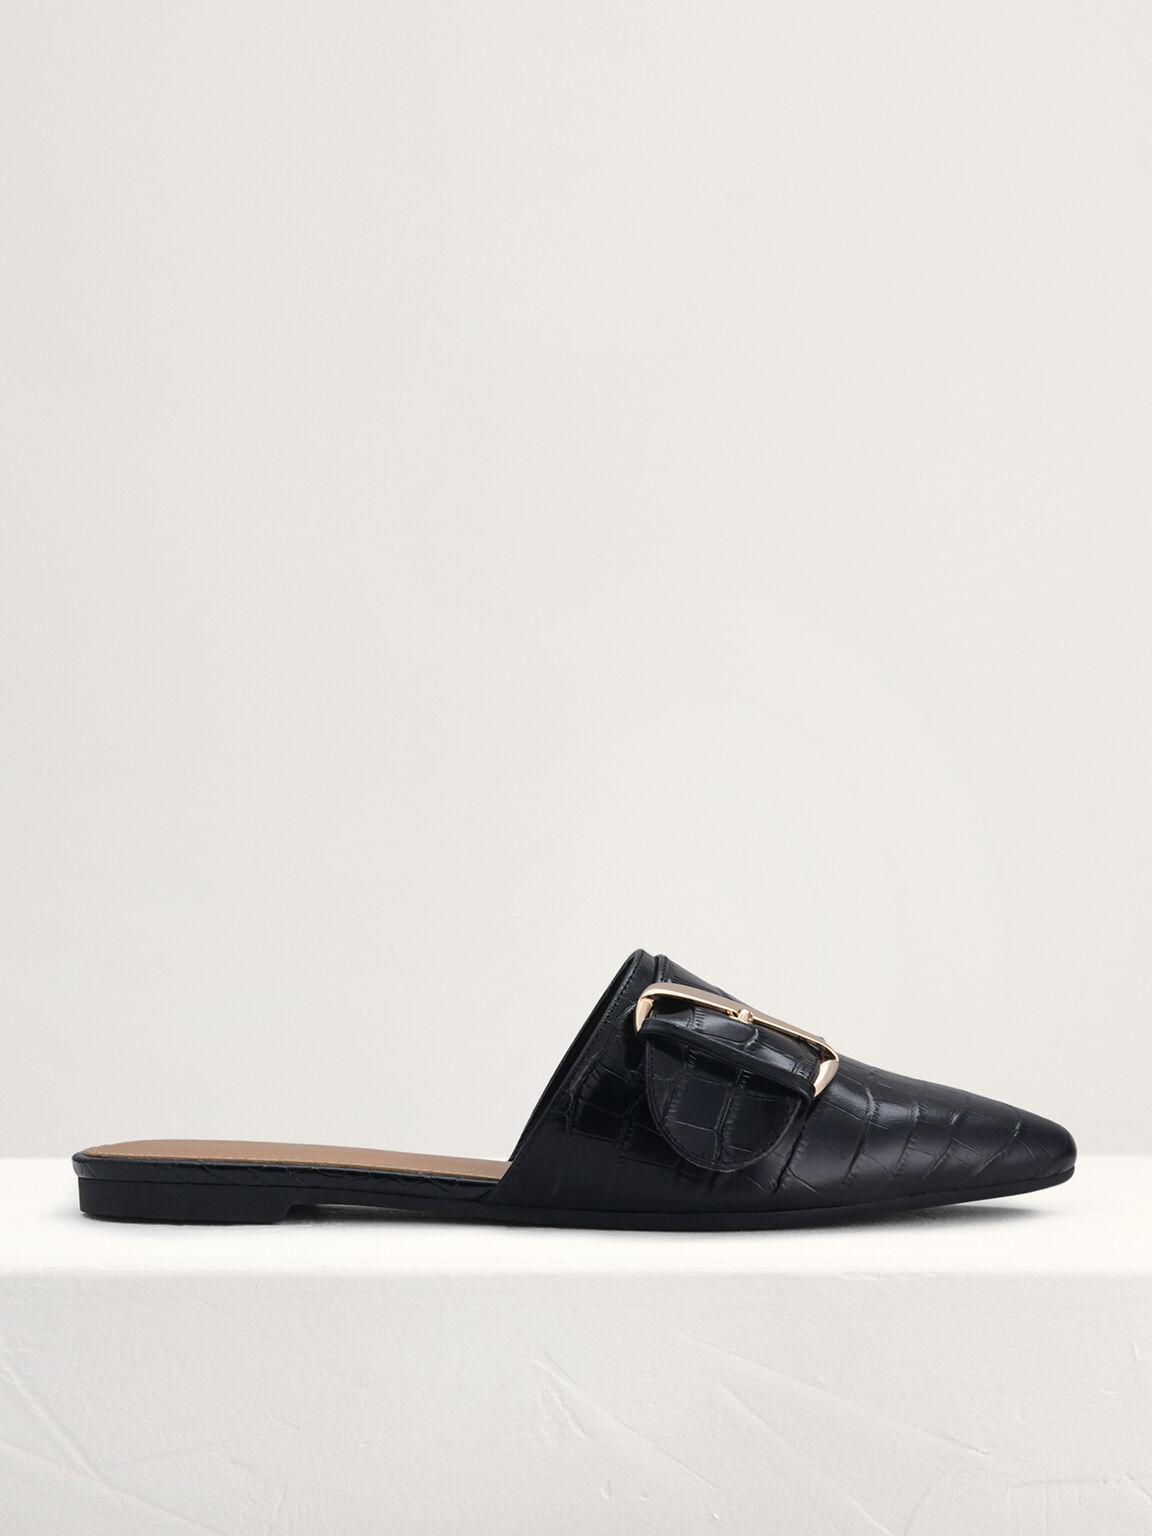 Croc-Effect Buckled Leather Mules, Black, hi-res